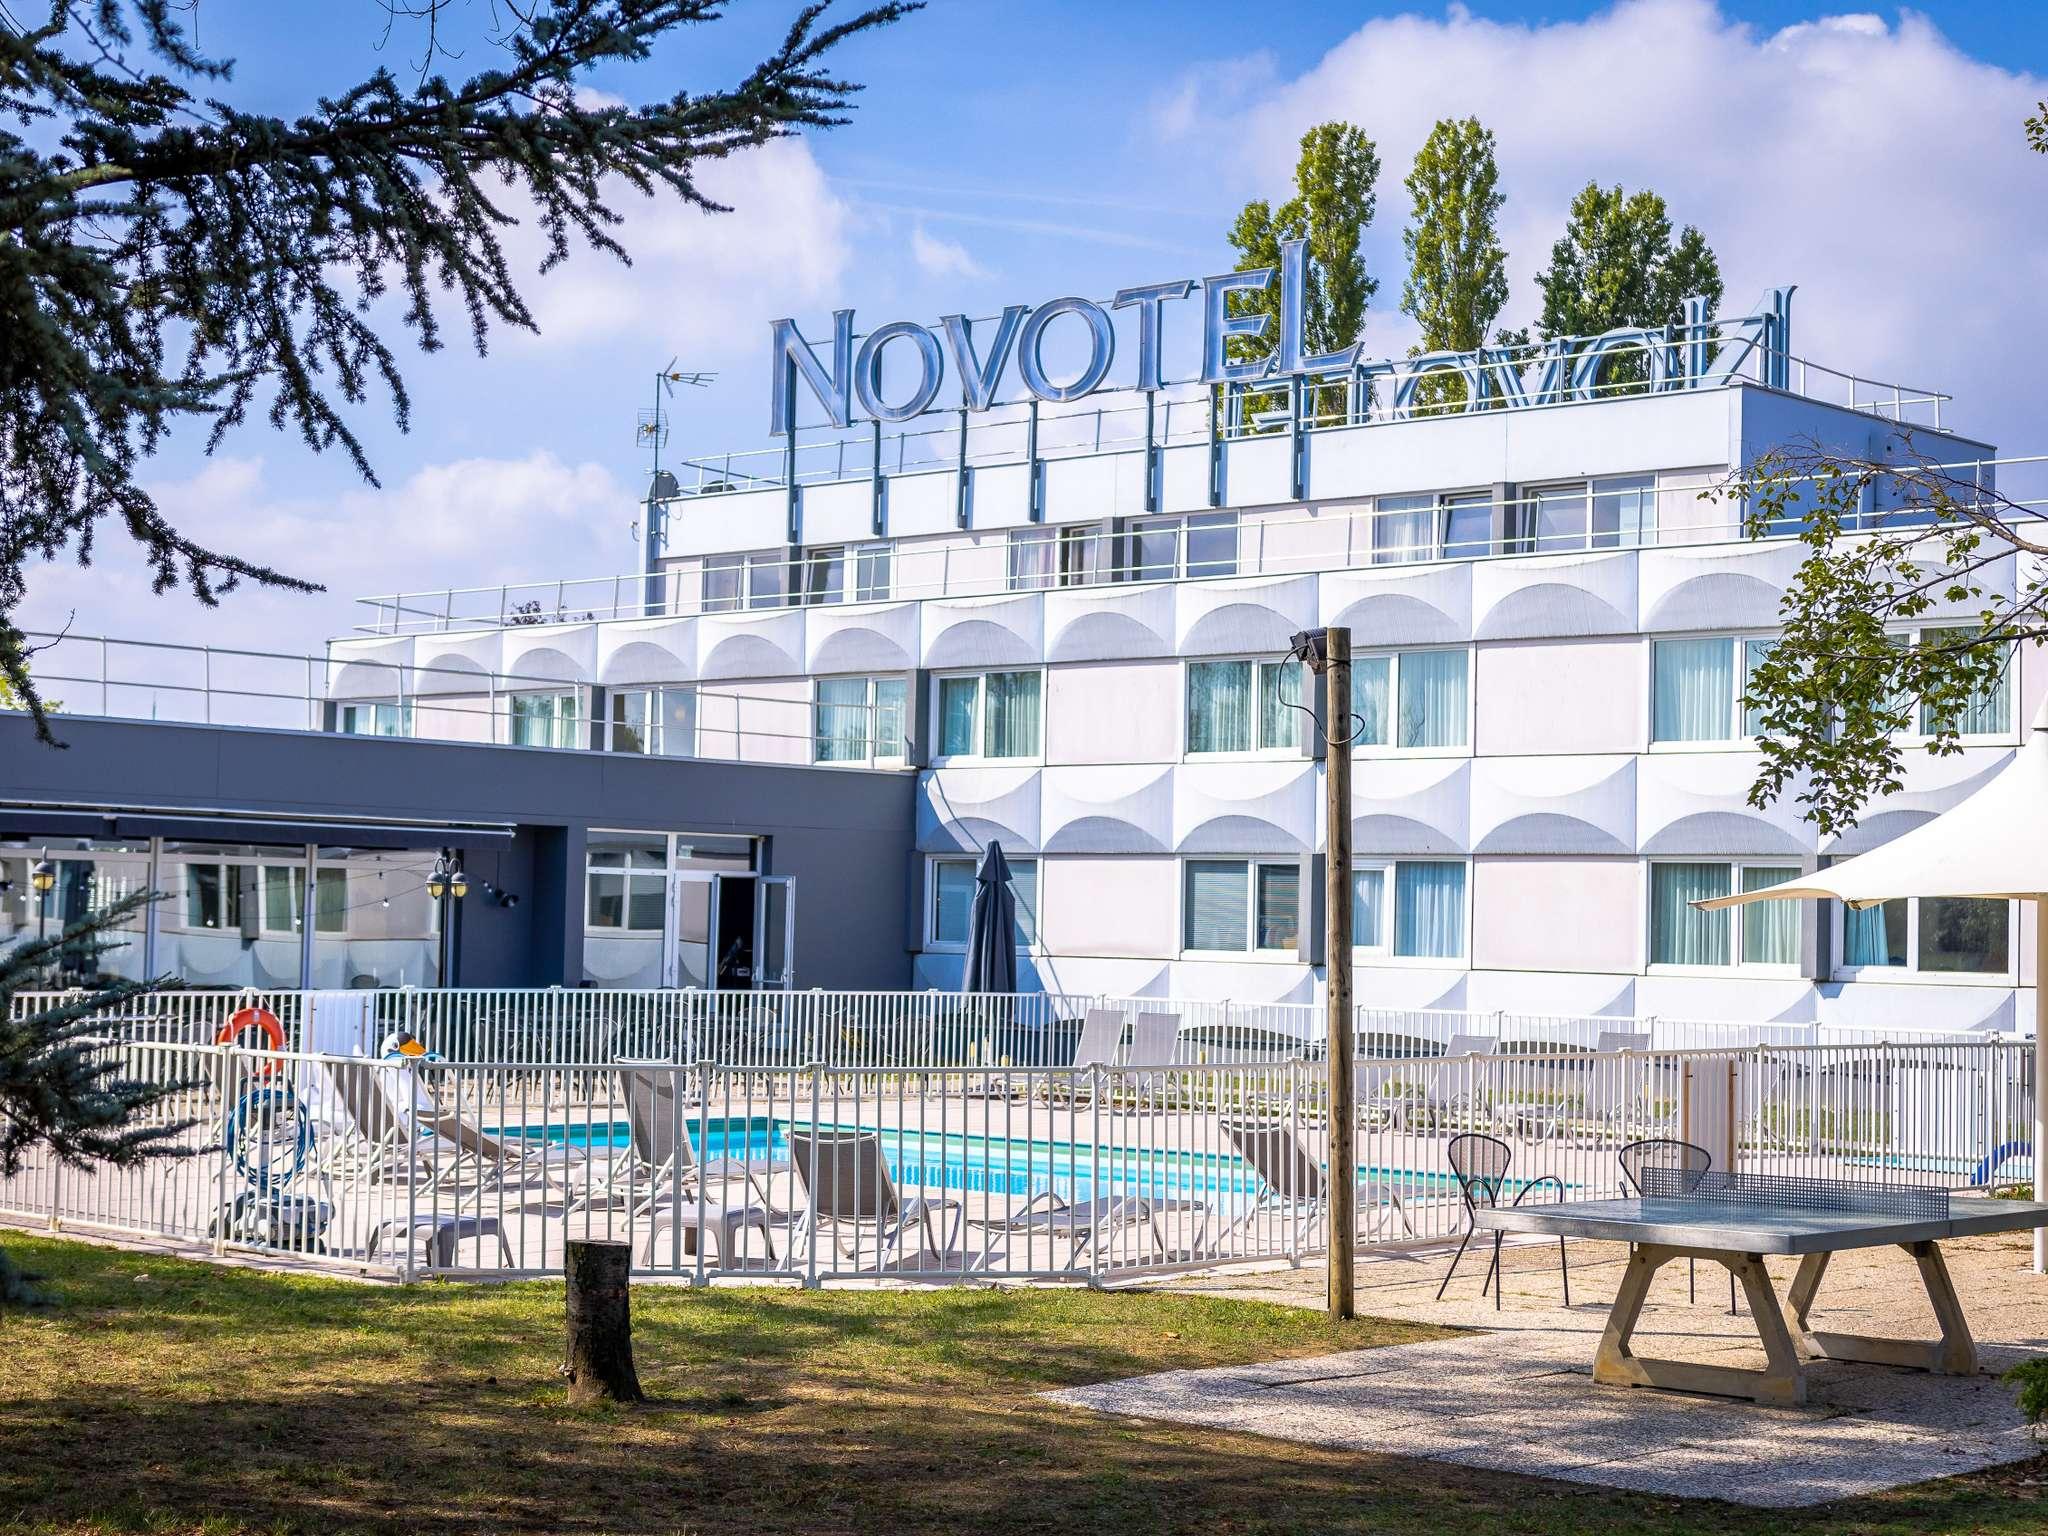 Hotel A Sausheim Novotel Mulhouse Bâle Fribourg Accor